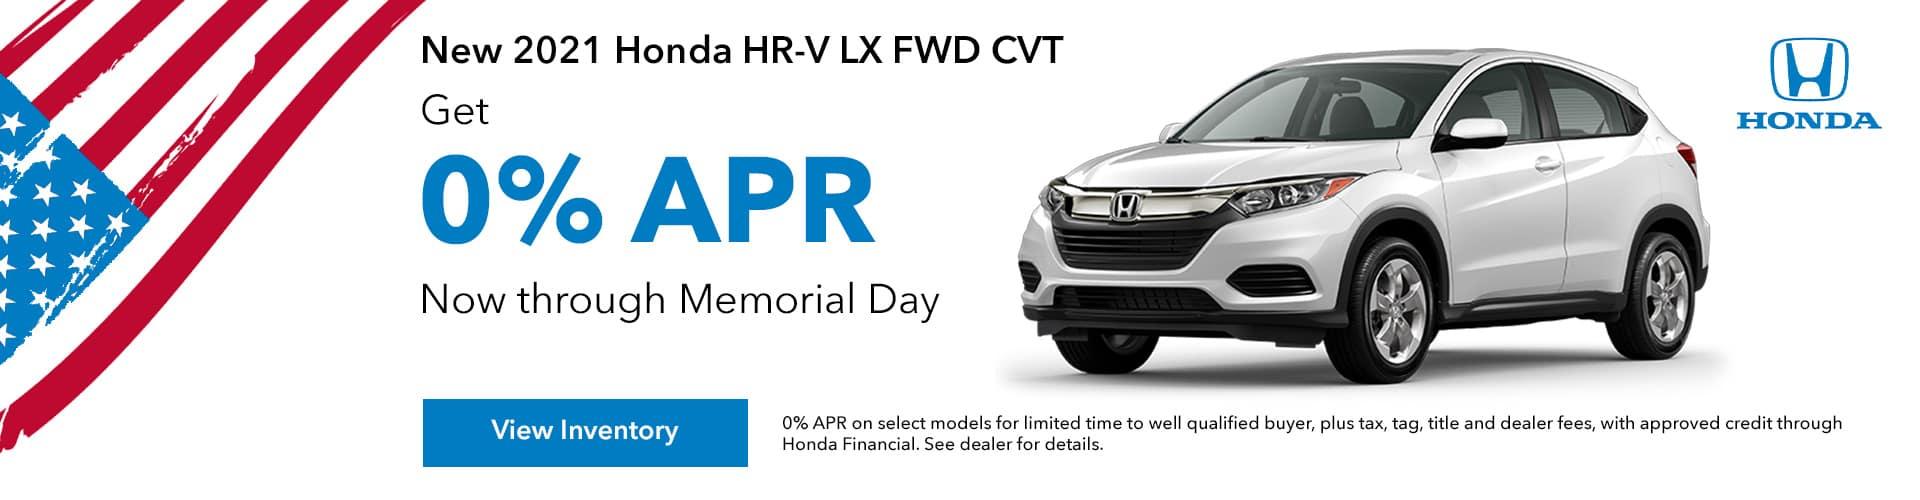 new 2021 Honda HR-V 0% APR, Get 0% APR For up to 72 Months